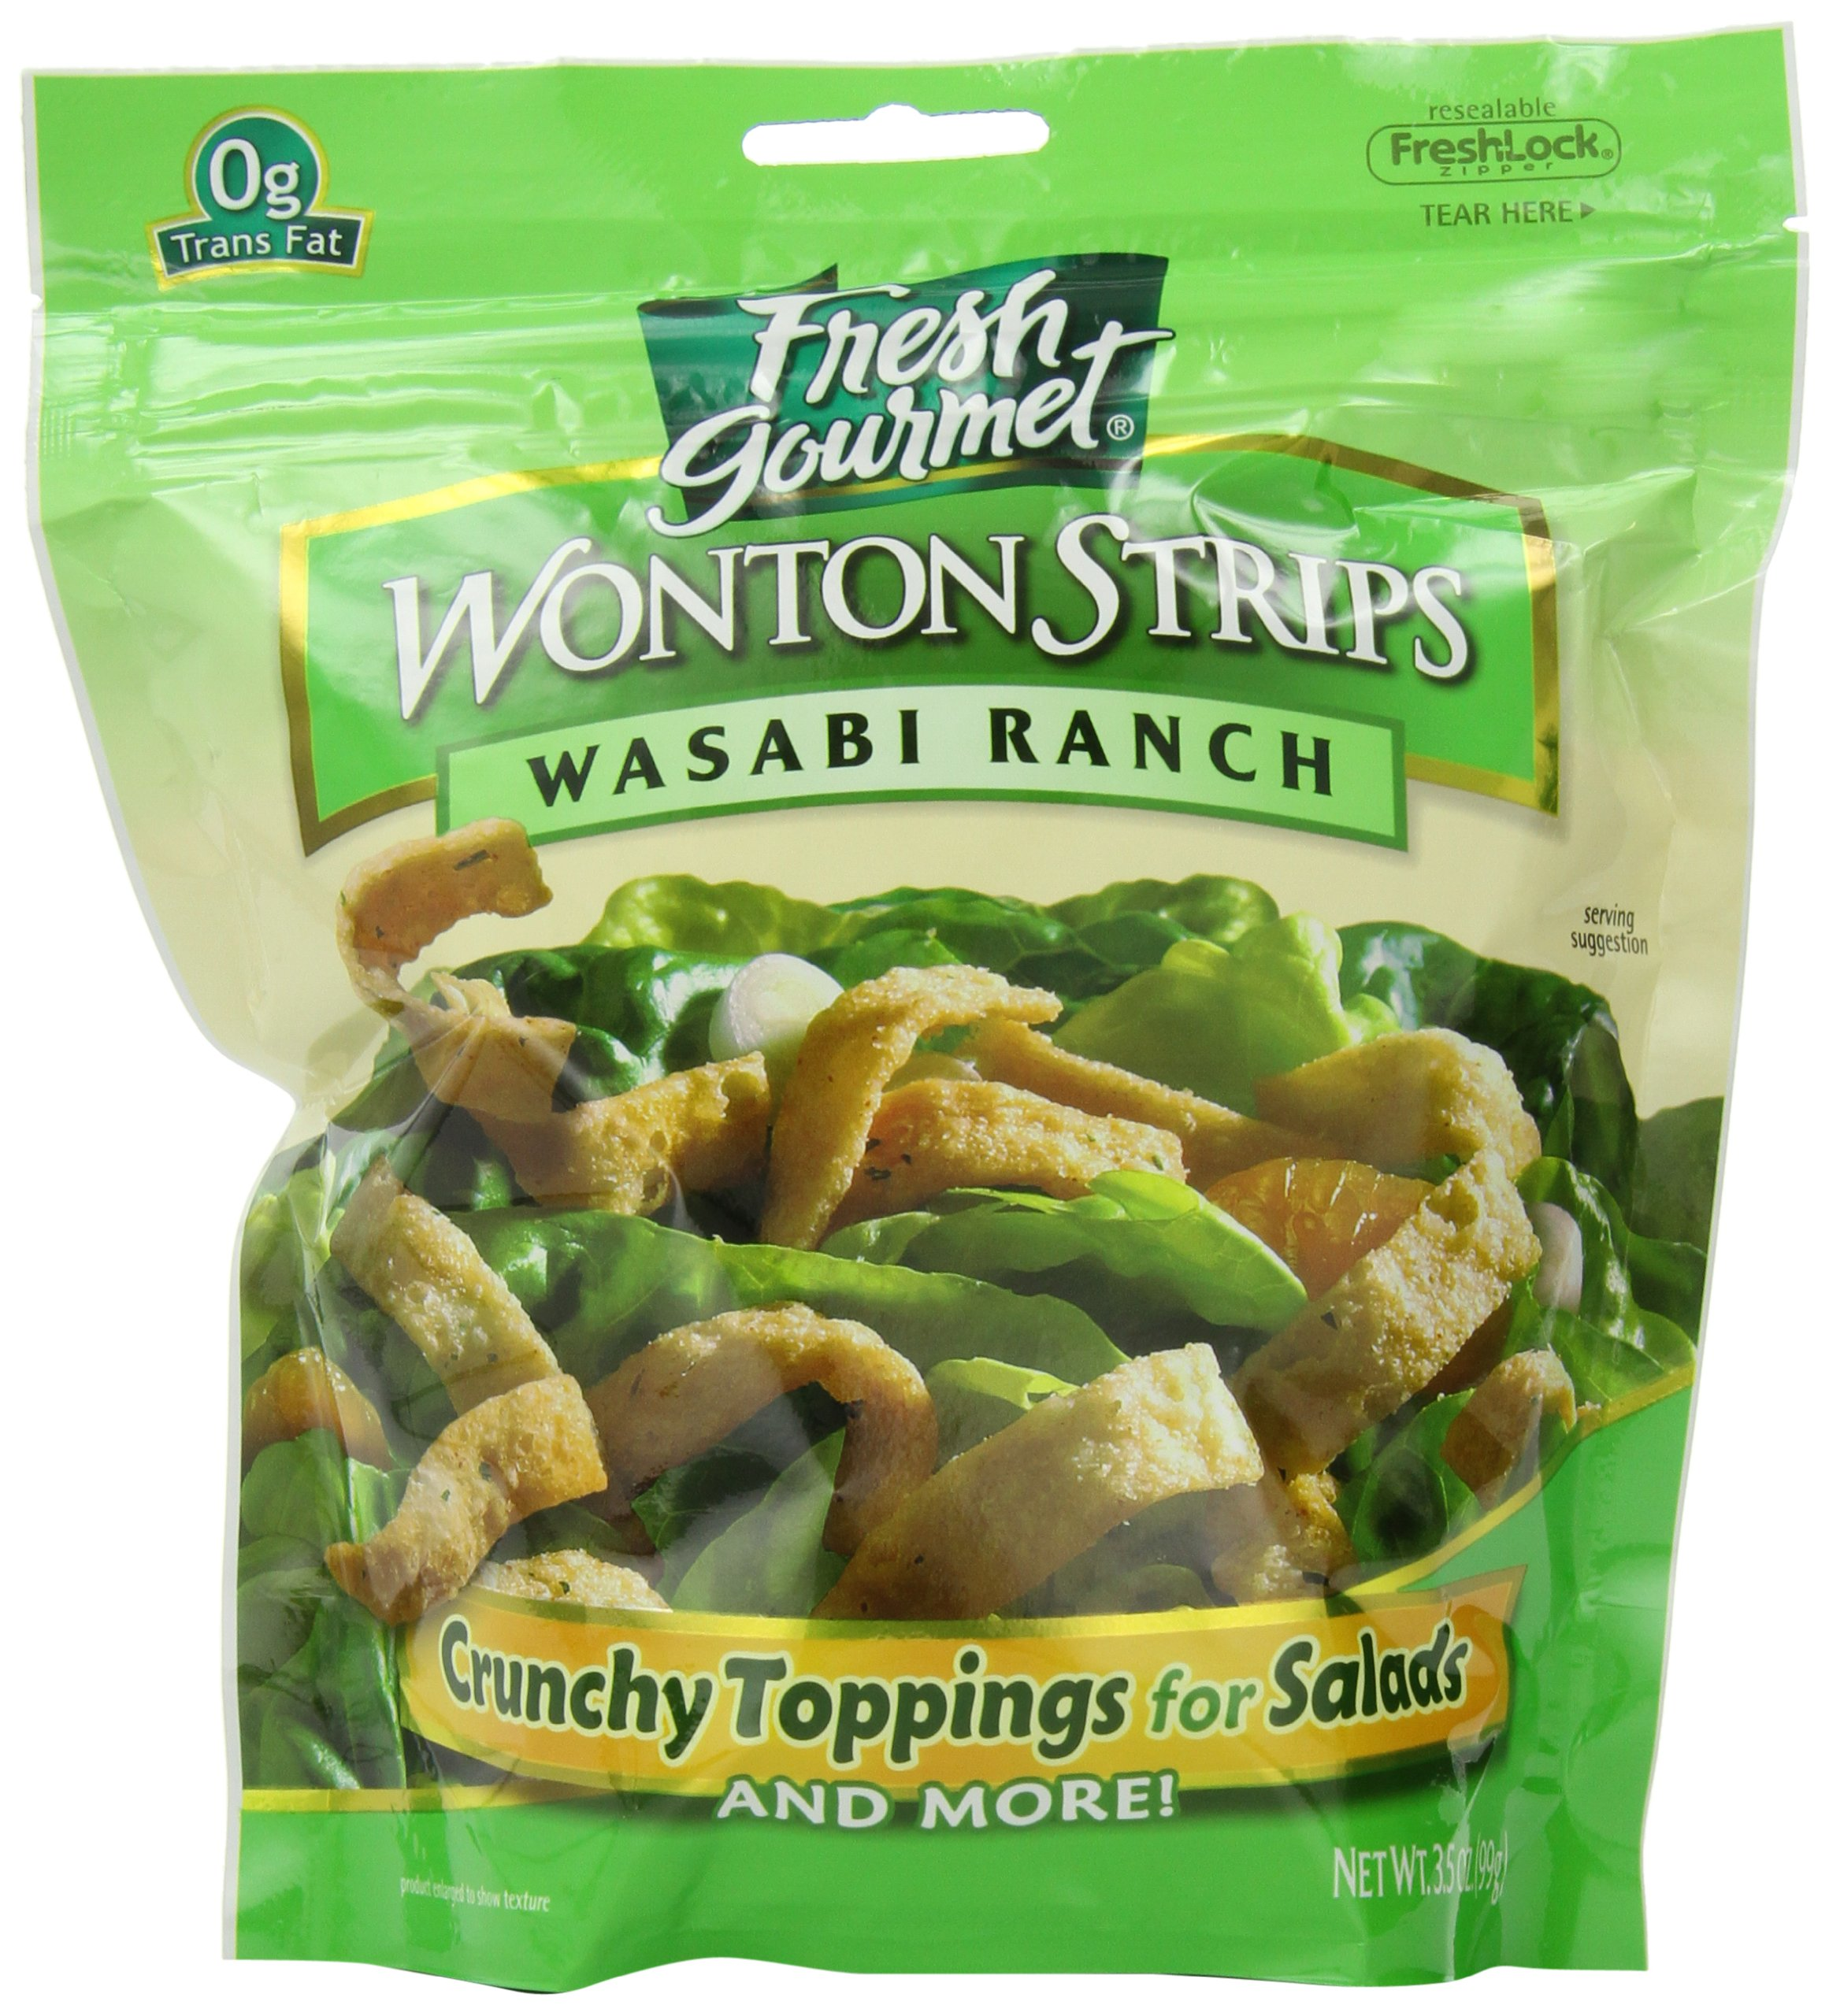 Fresh Gourmet Won Ton Strips, Wasabi Ranch, 3.5 Ounce (Pack of 9)